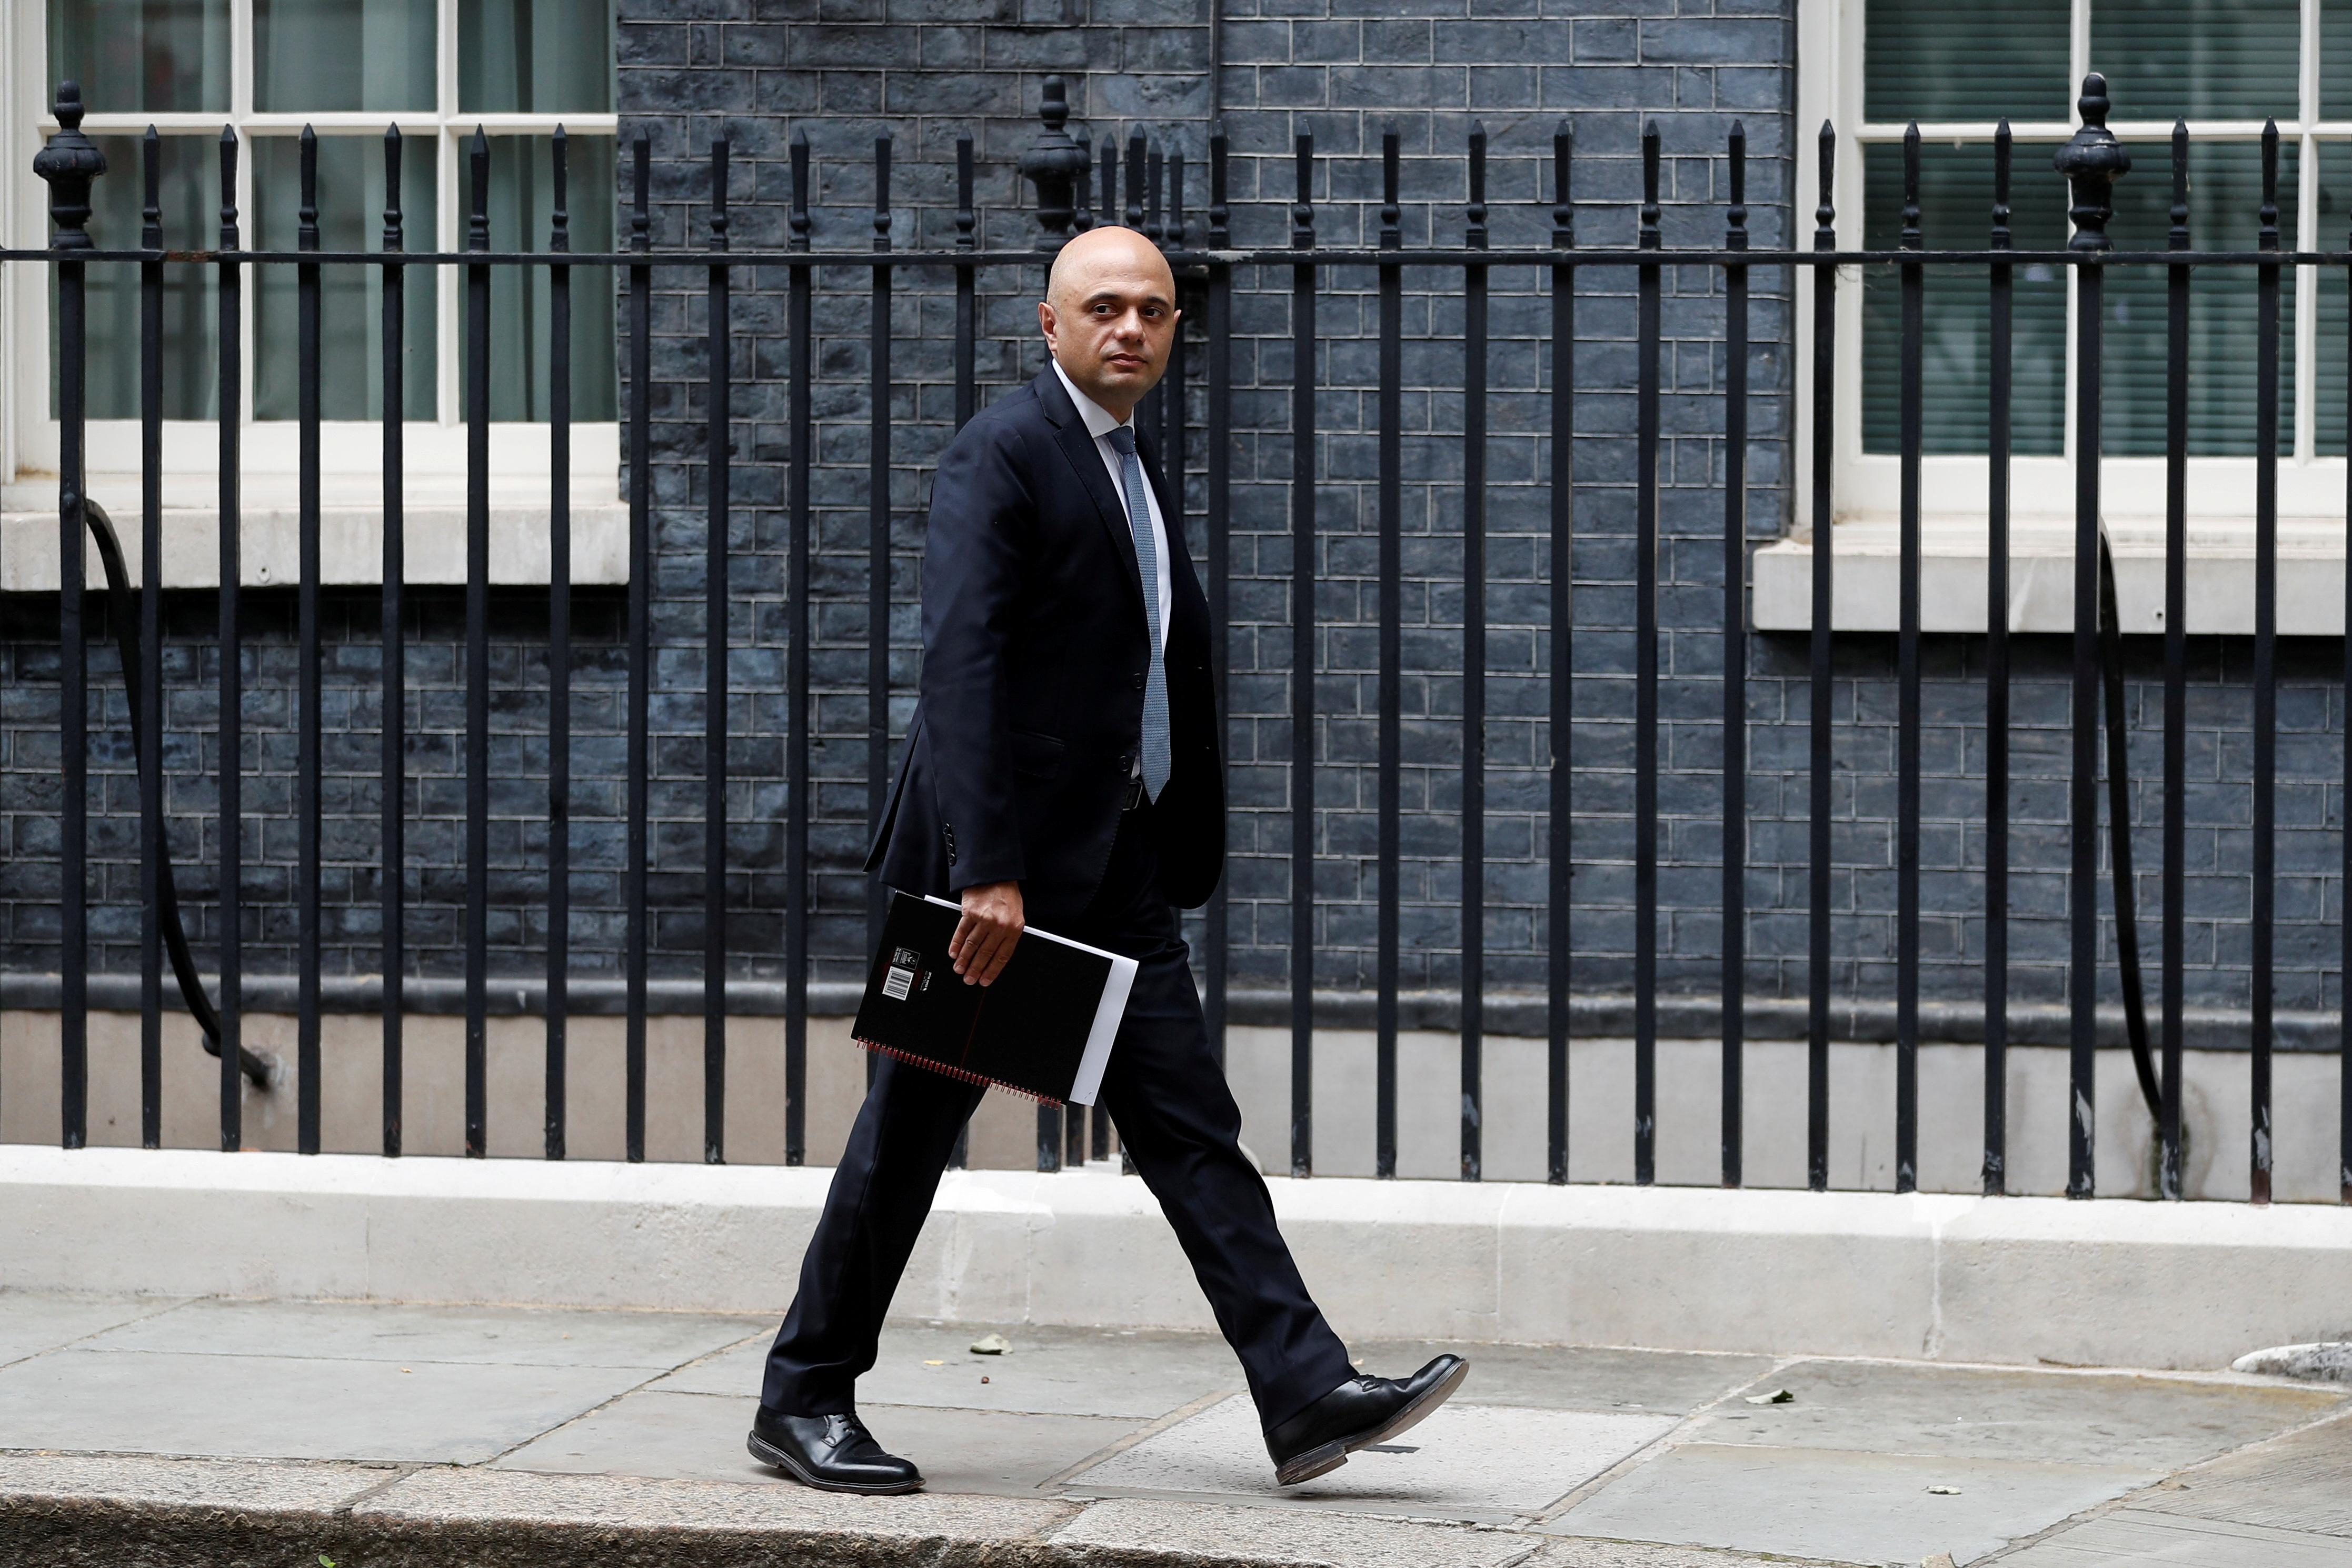 Britain's Health Secretary Sajid Javid walks on Downing Street in London, Britain, July 14, 2021. REUTERS/Peter Nicholls/File Photo